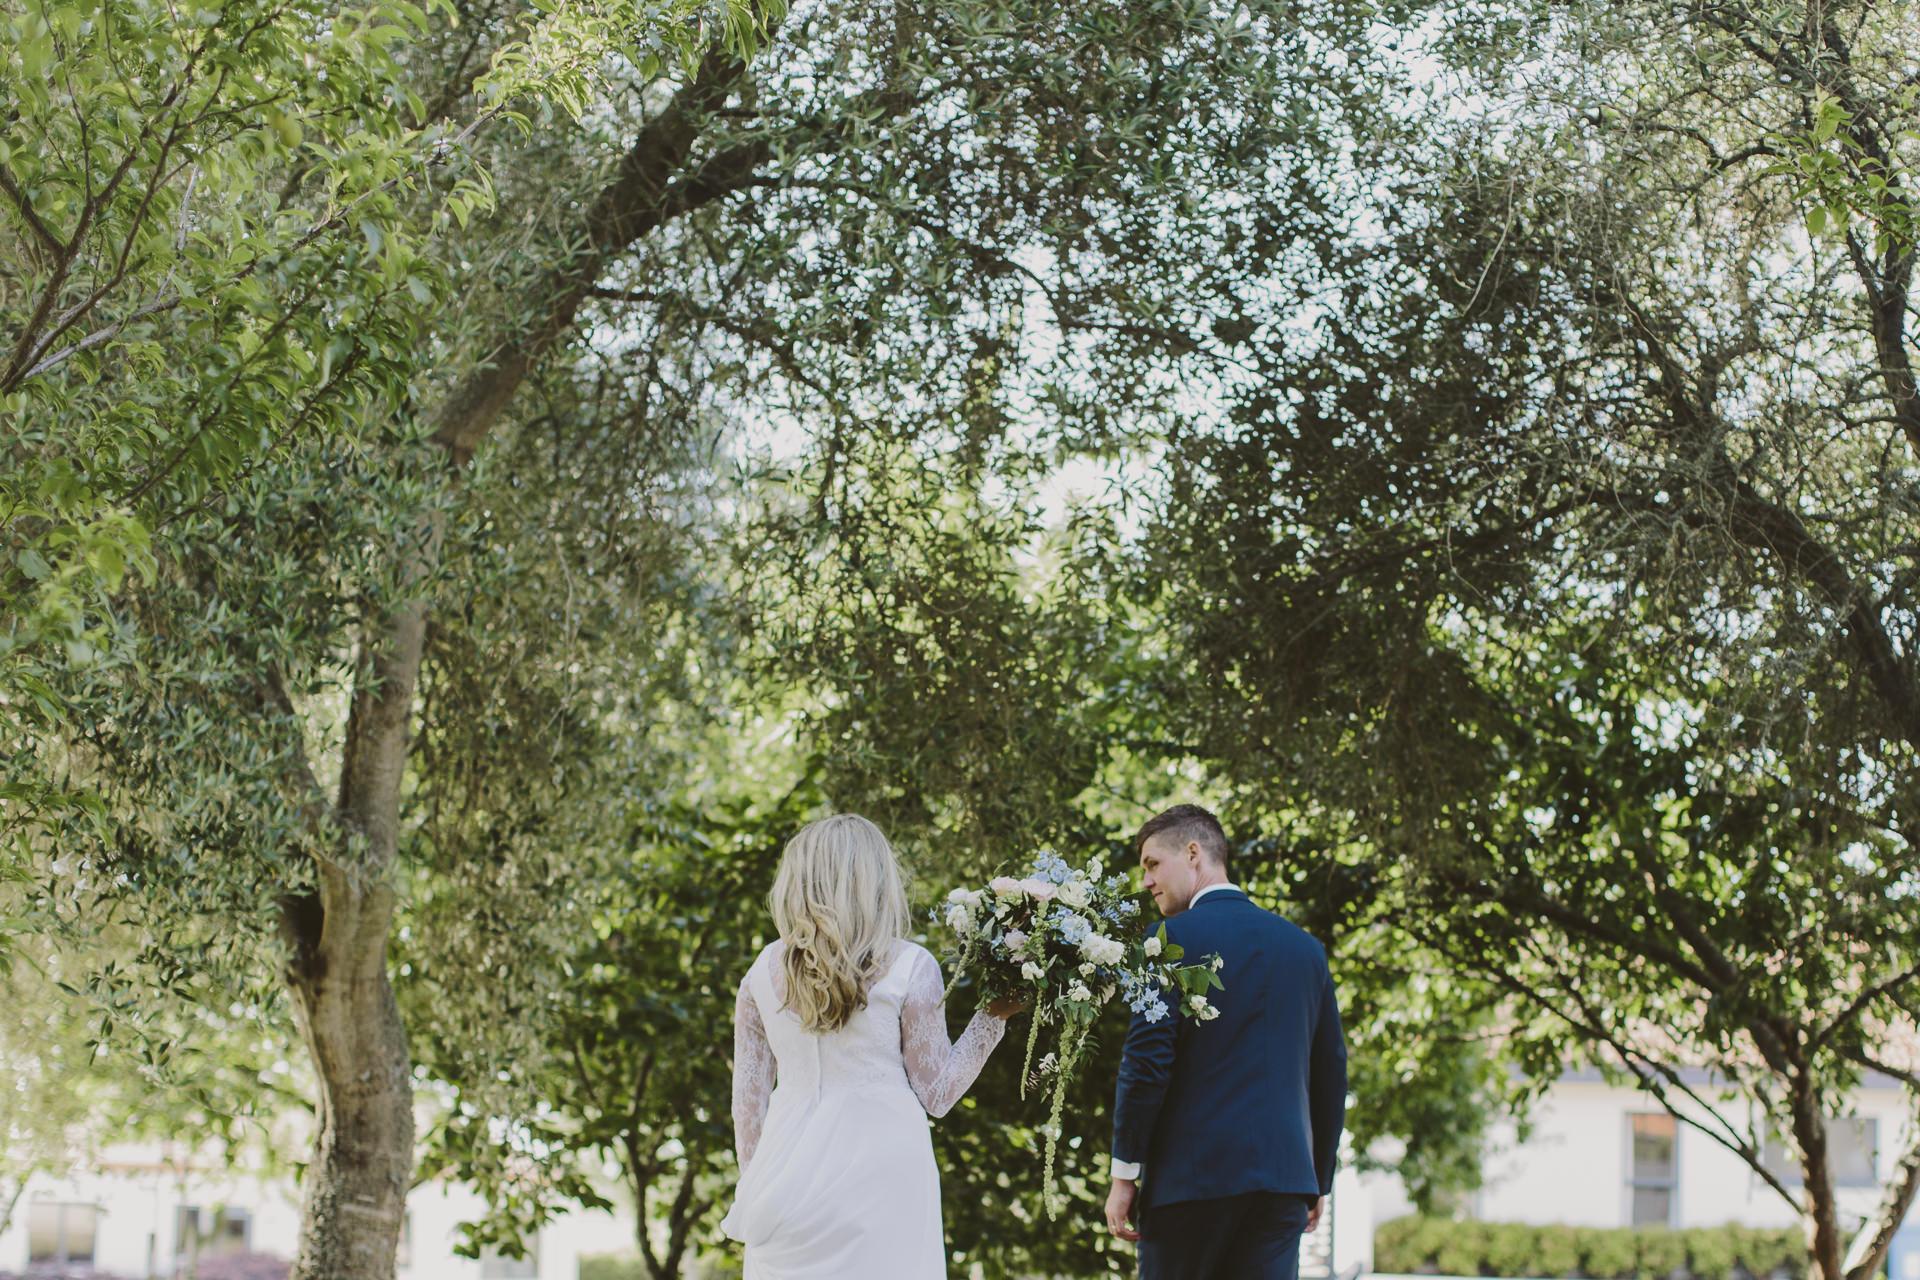 hamilton-wedding-portrait-photographer-r-1-21